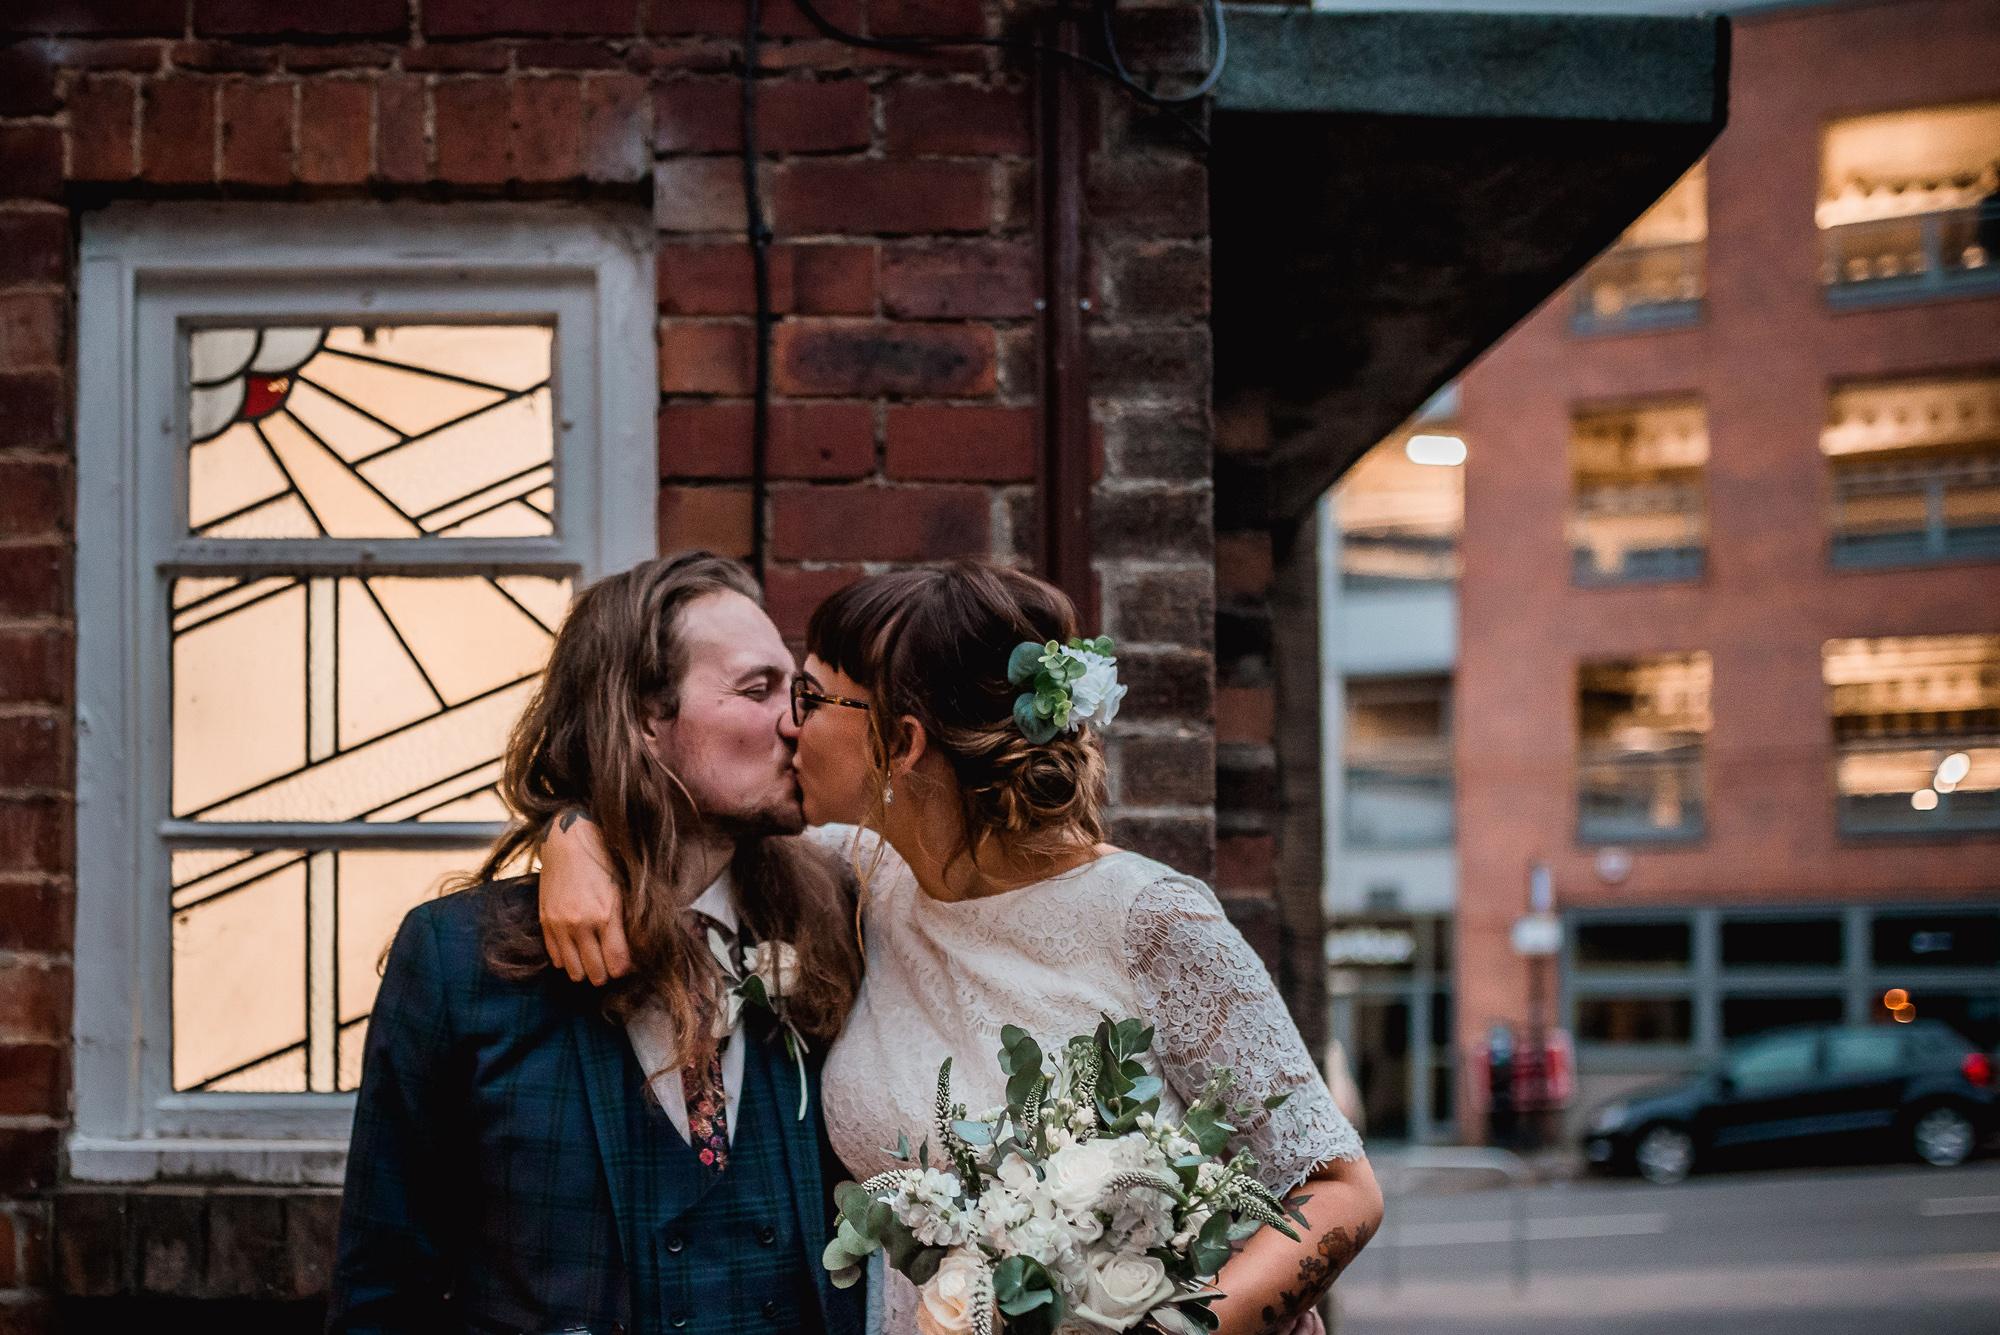 Harriet-Dahlia-Bespoke-Lace-Silk-Bohemian-Wedding-Dress-Sleeves-Tattooed-Bride-Alternative-Wedding-Sheffield-39.jpg